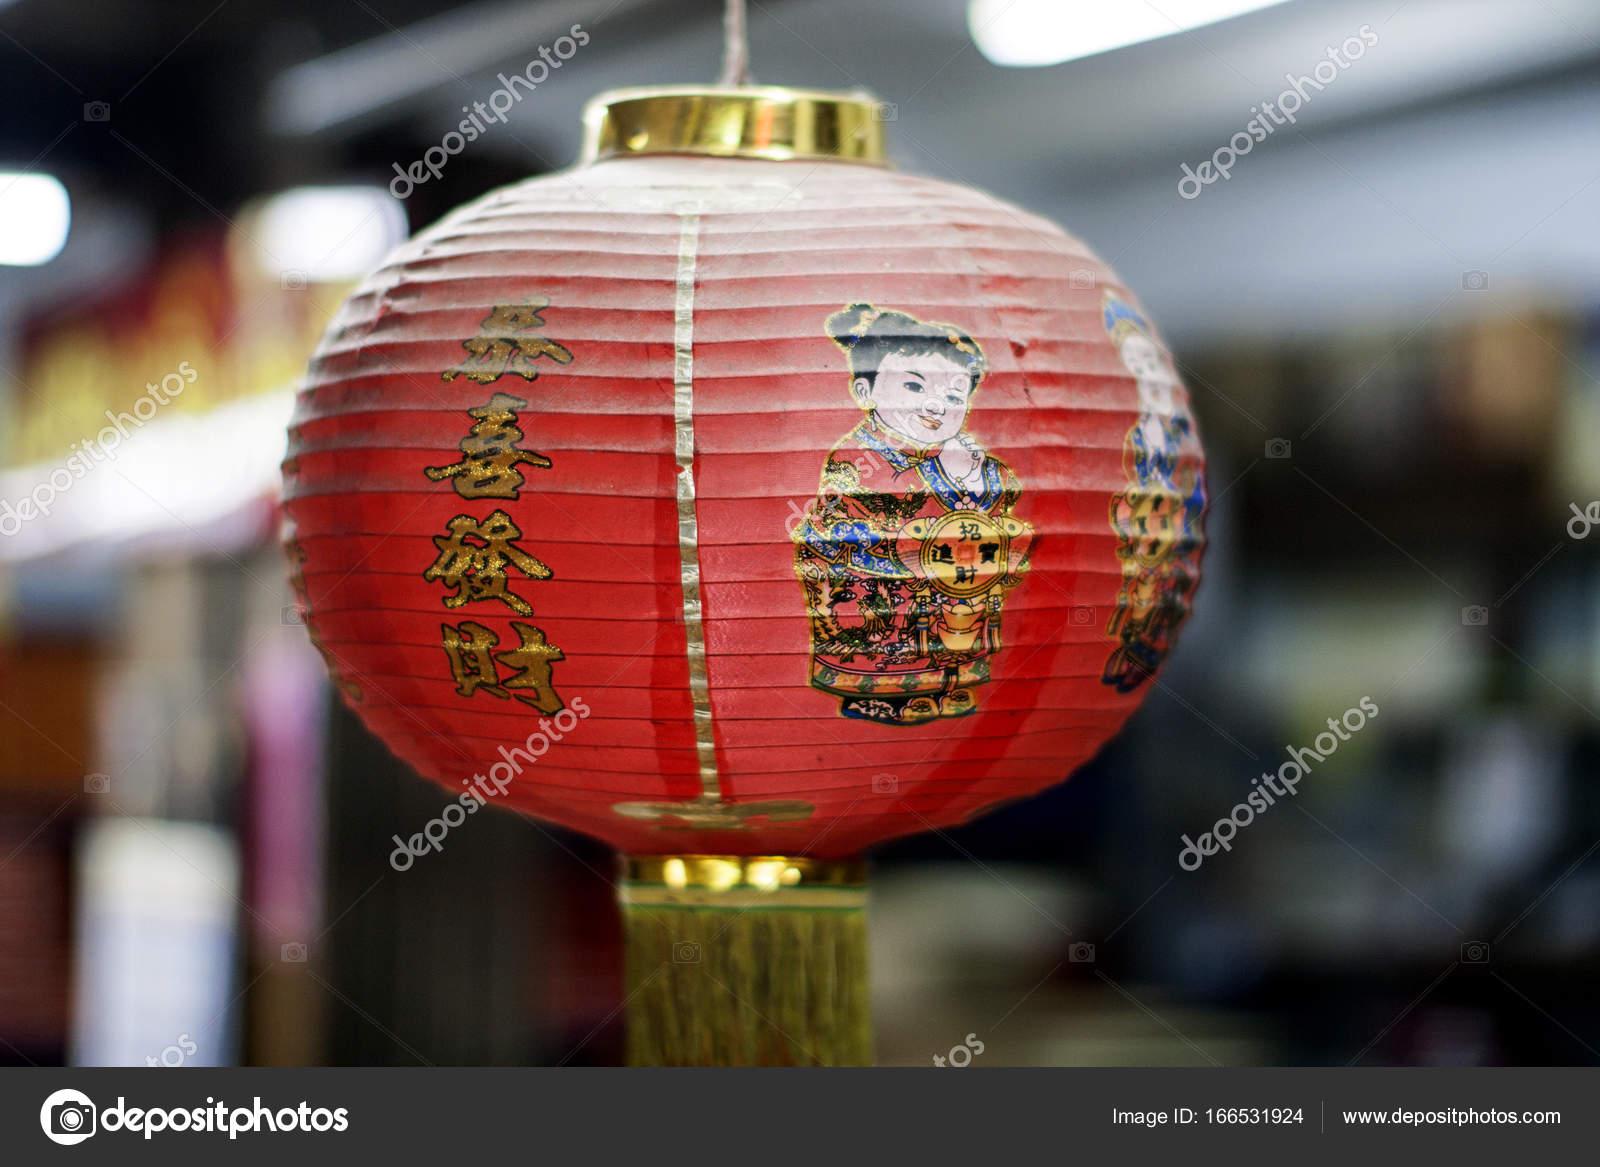 Lampadario Carta Cinese.Lampada Di Carta Tradizionale Cinese Rosso Foto Stock